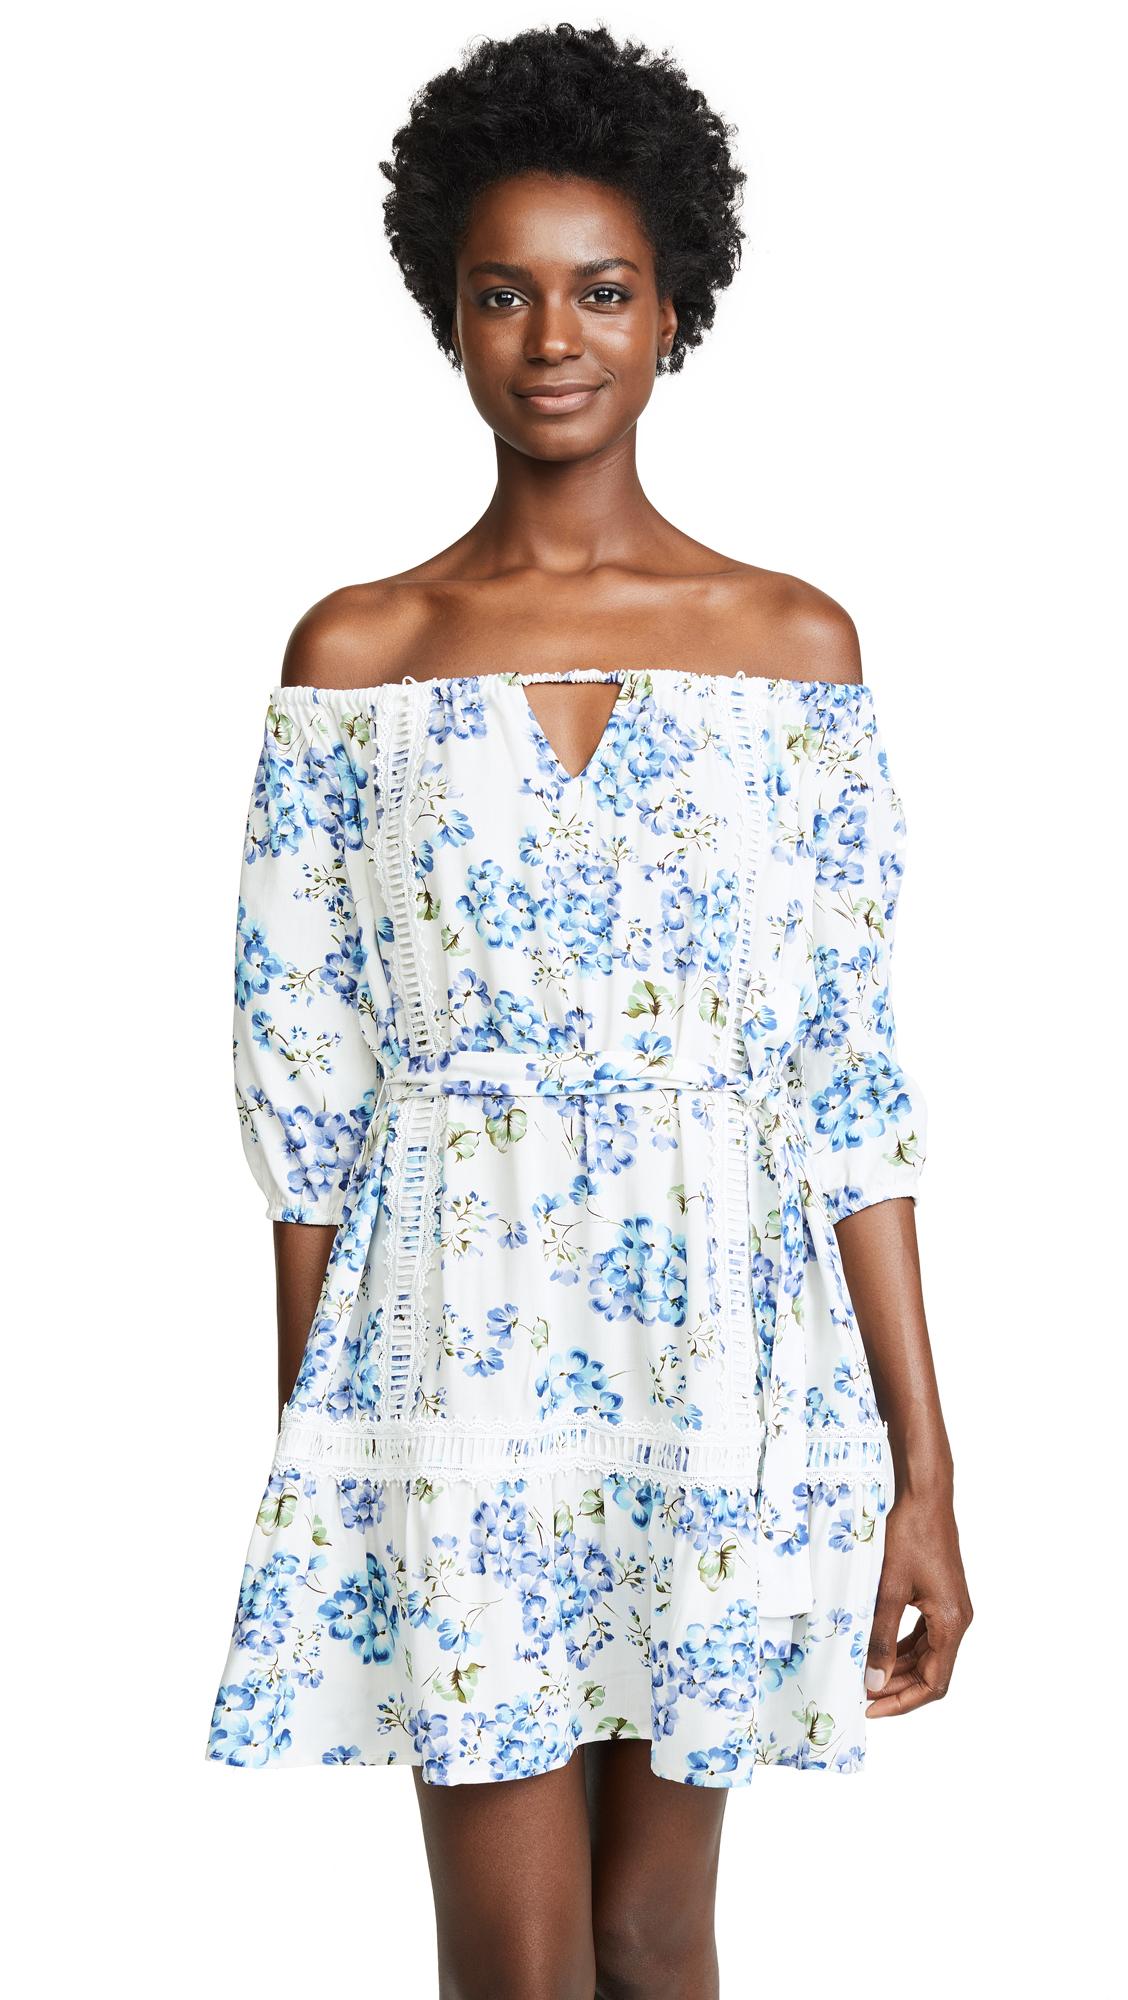 AFTER MARKET Woven One Shoulder Dress, White